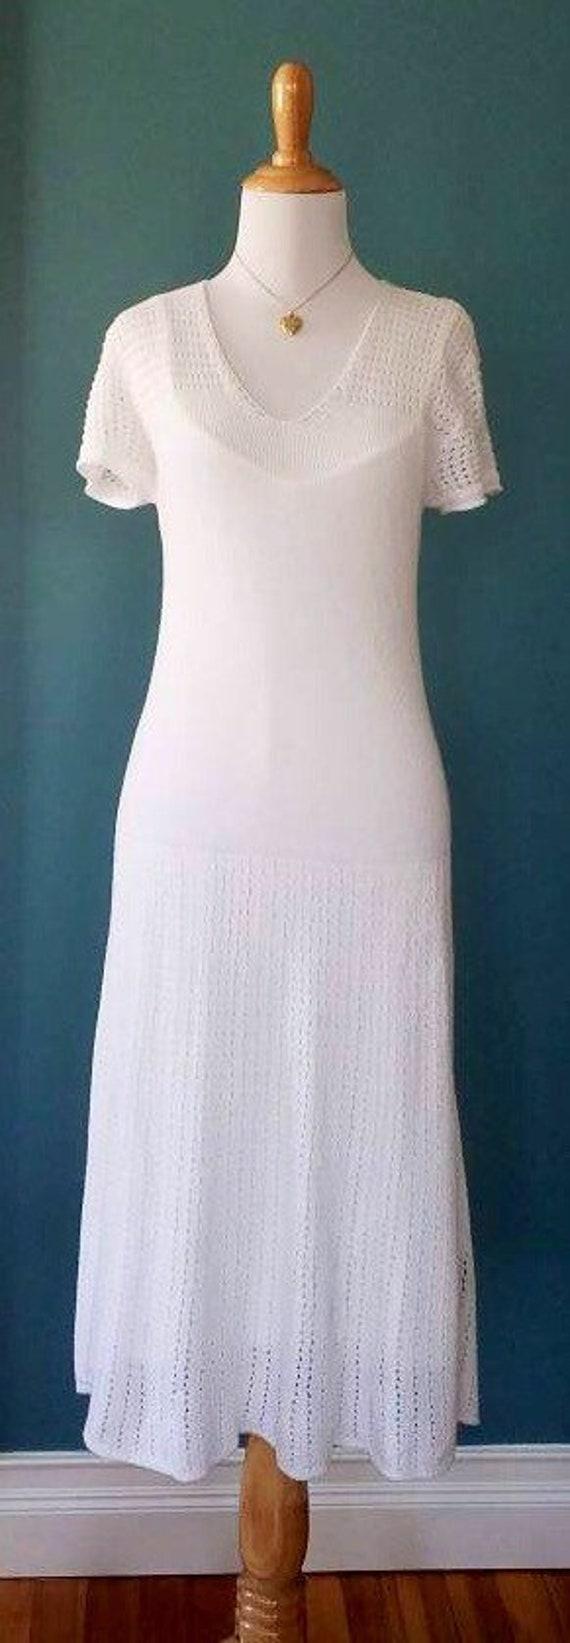 Vintage 20s // 30s // 40s Style White Knit Dress - image 4